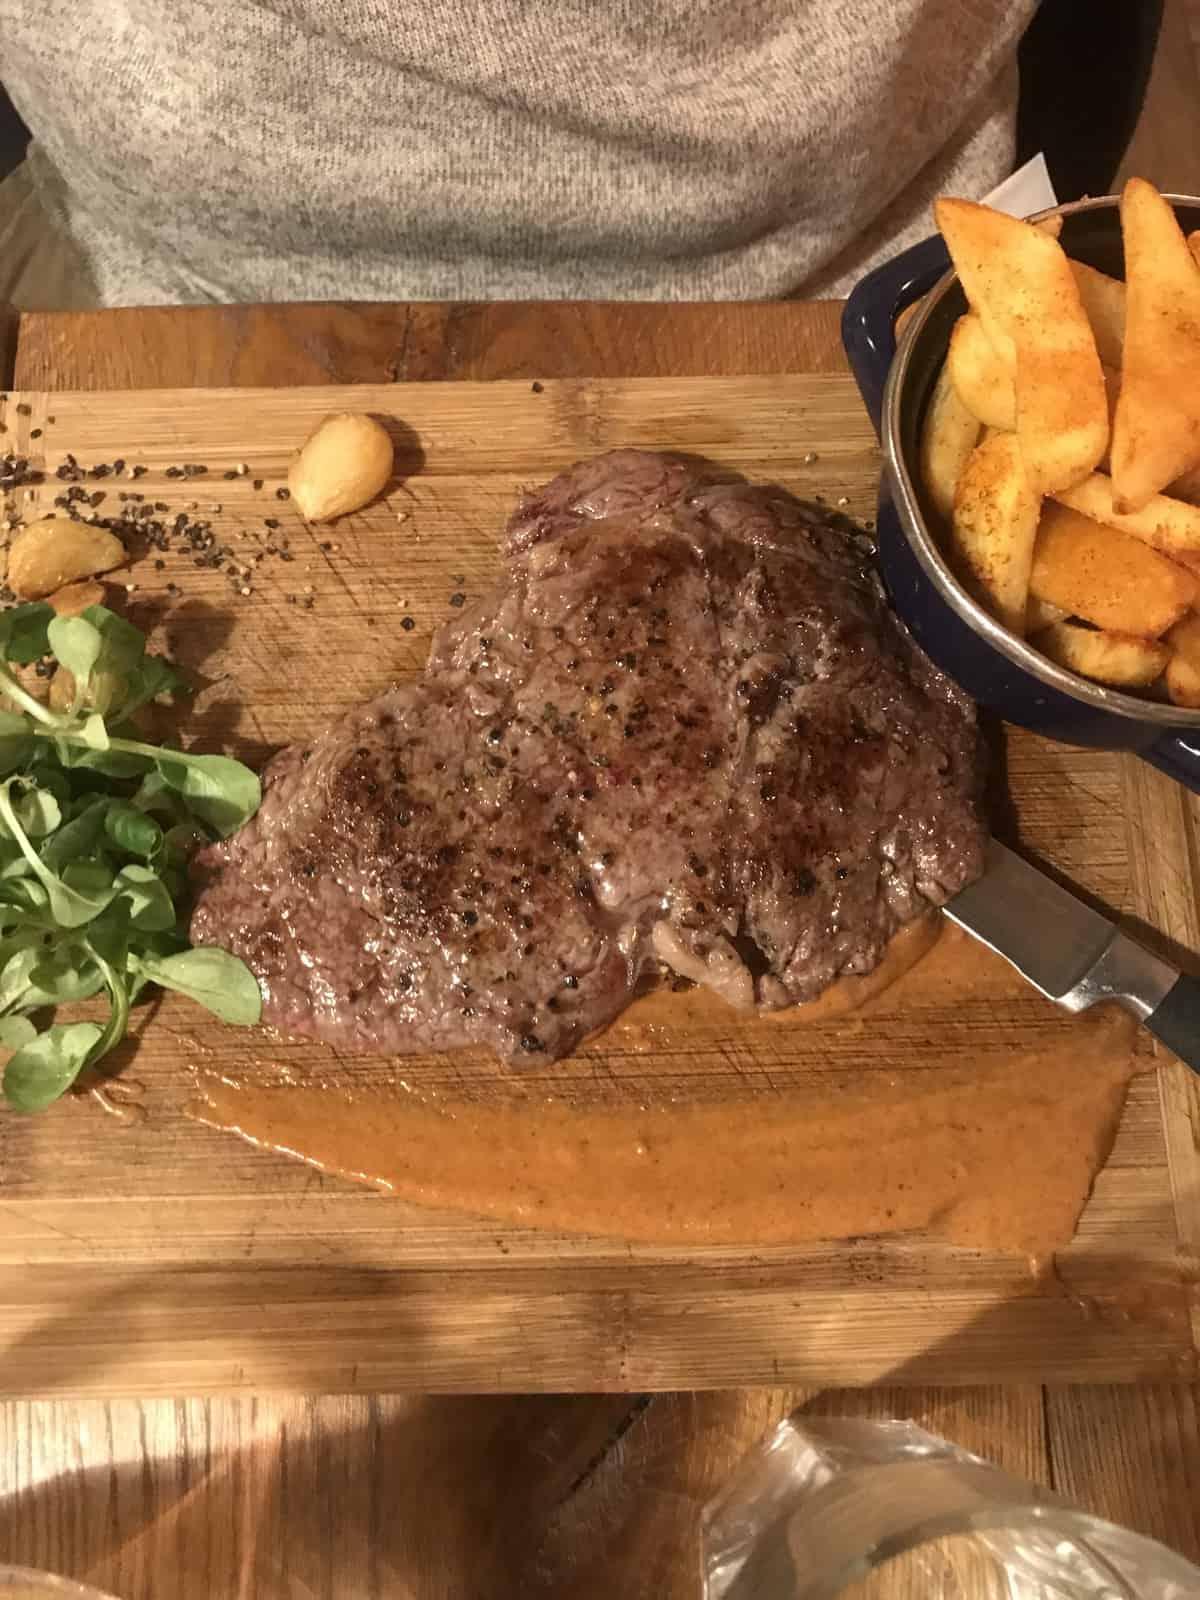 ribeye steak at Restauracja Slawkowska restaurant in Krakow, Poland